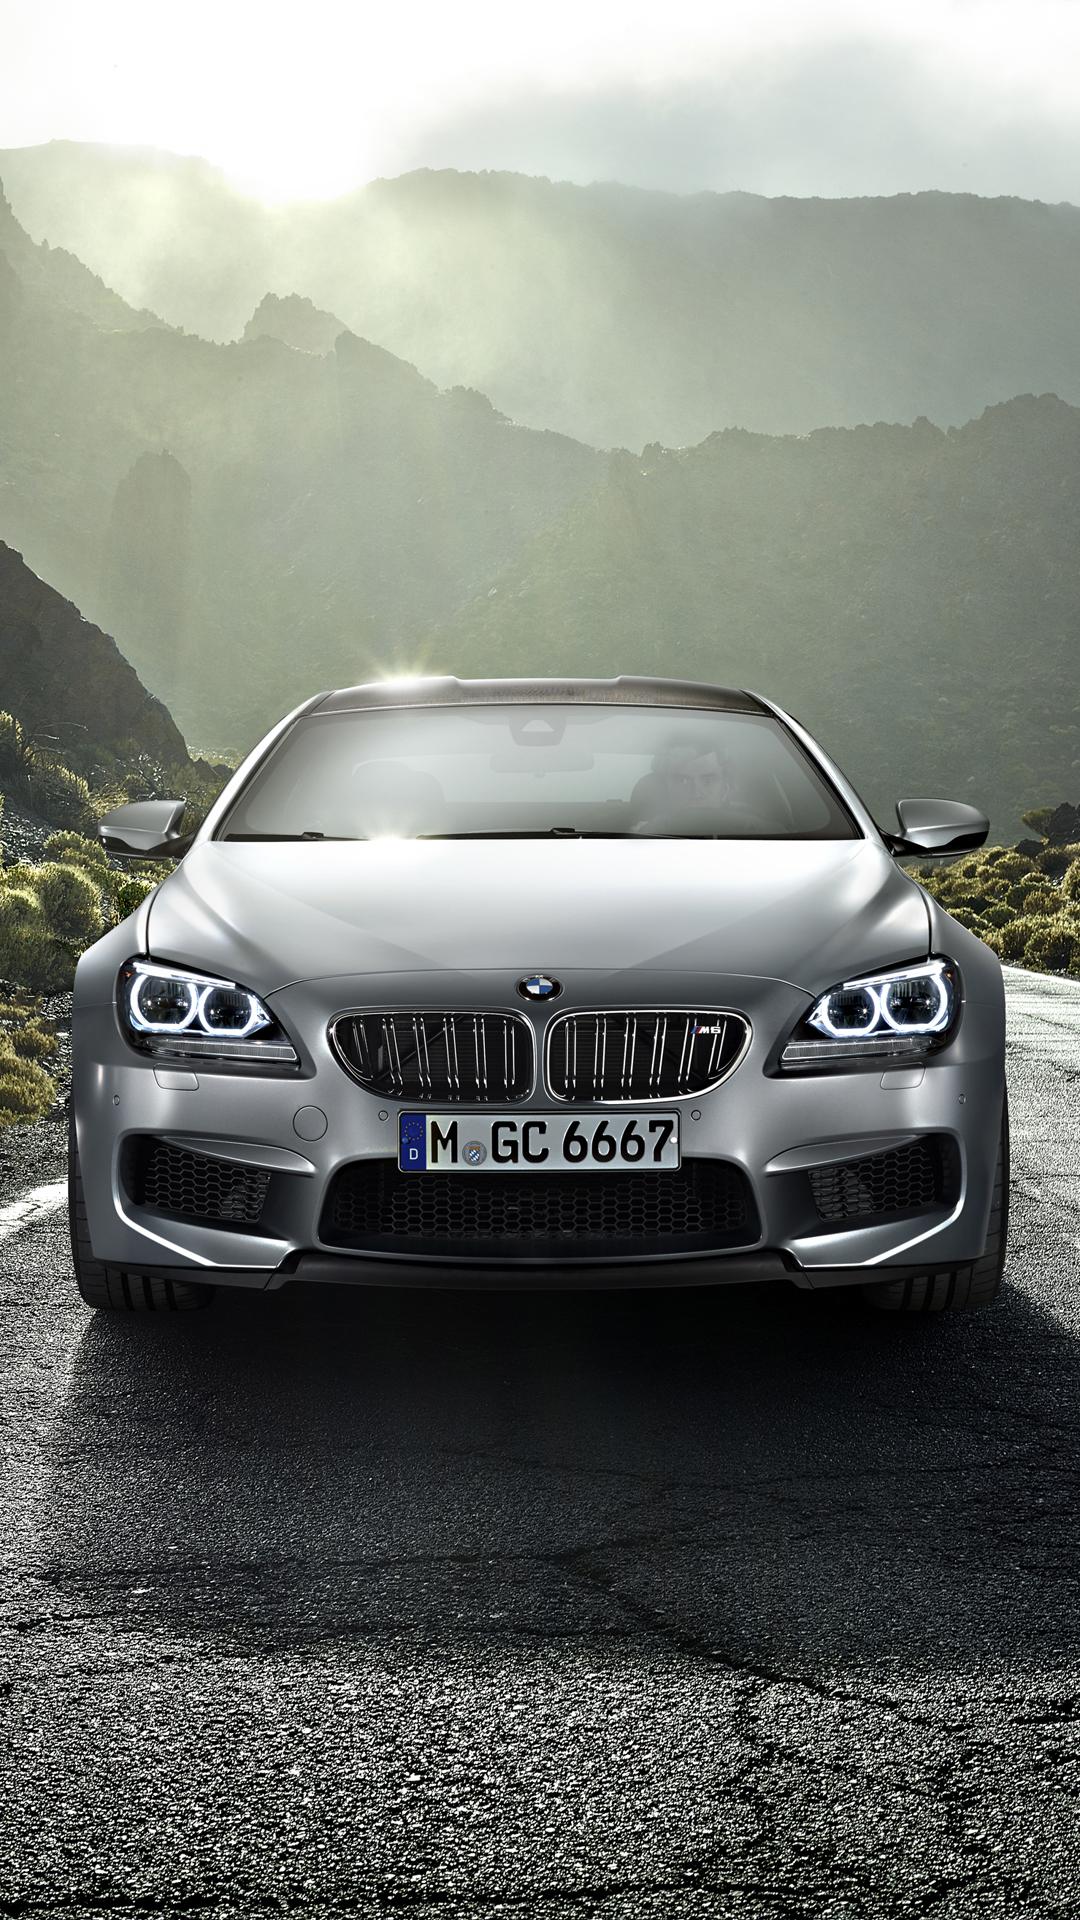 Bmw M6 Bmw M6 Gran Coupe Front 1080x1920 Download Hd Wallpaper Wallpapertip